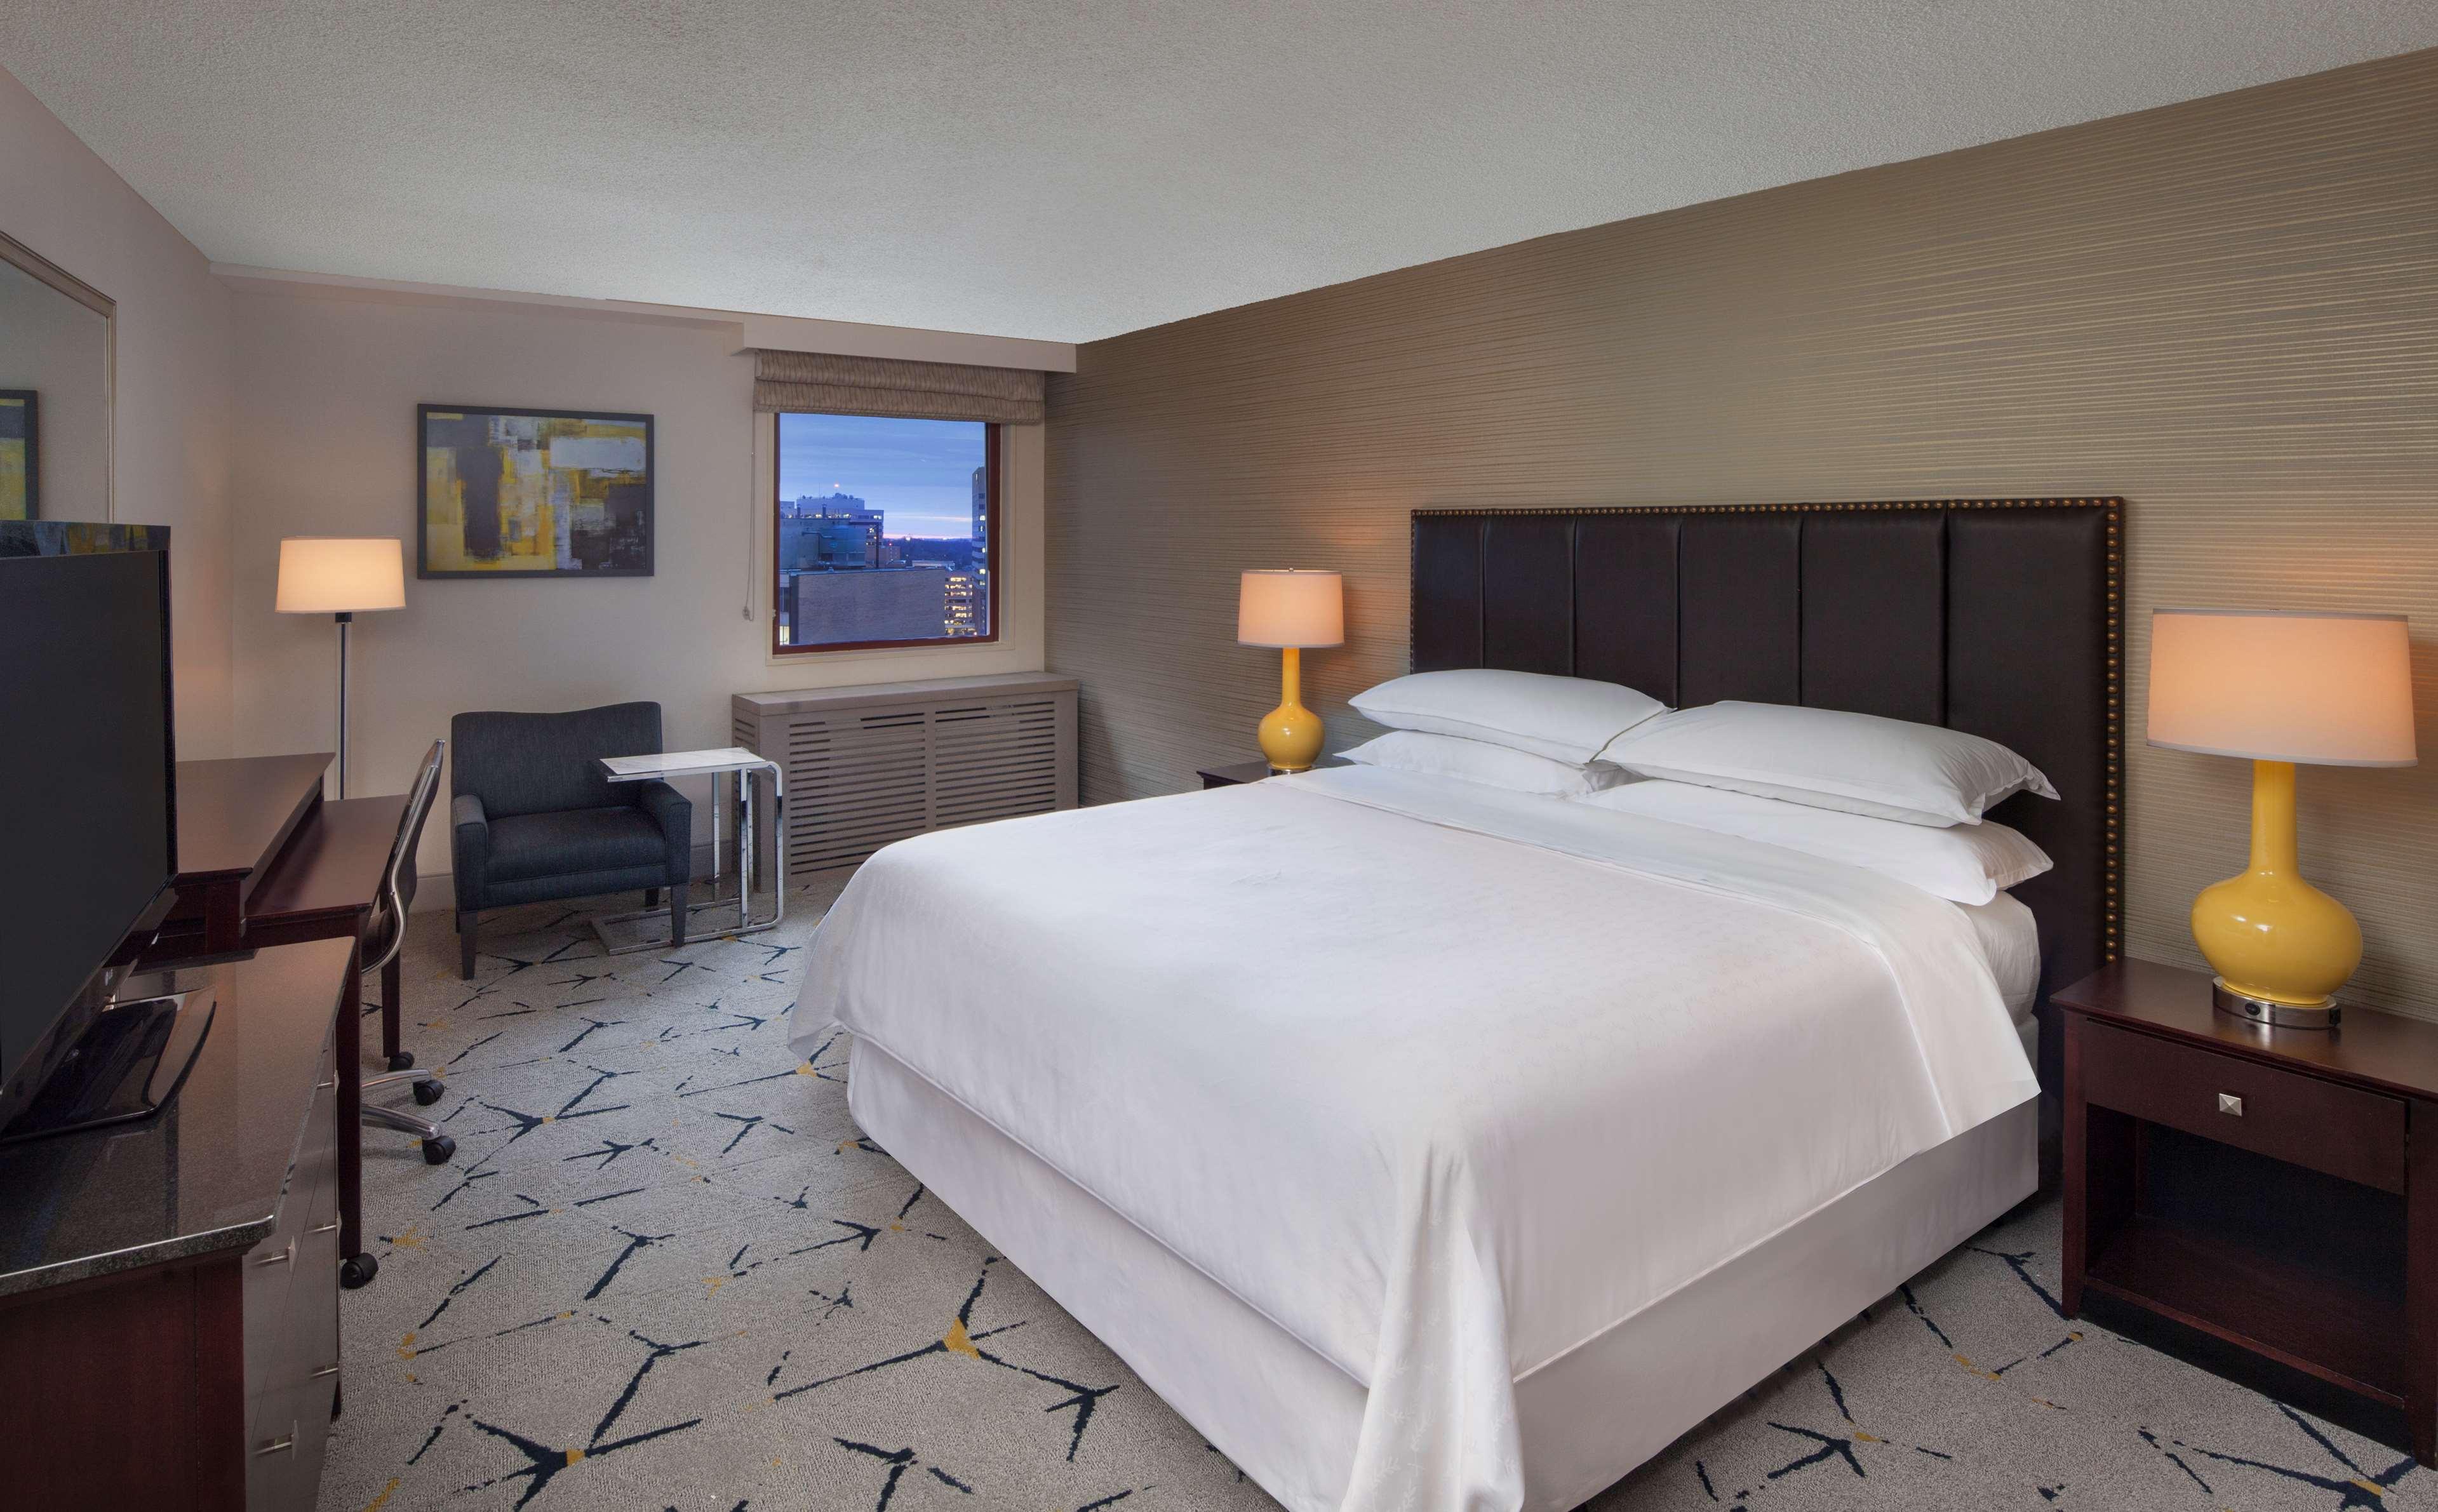 Sheraton Silver Spring Hotel image 4